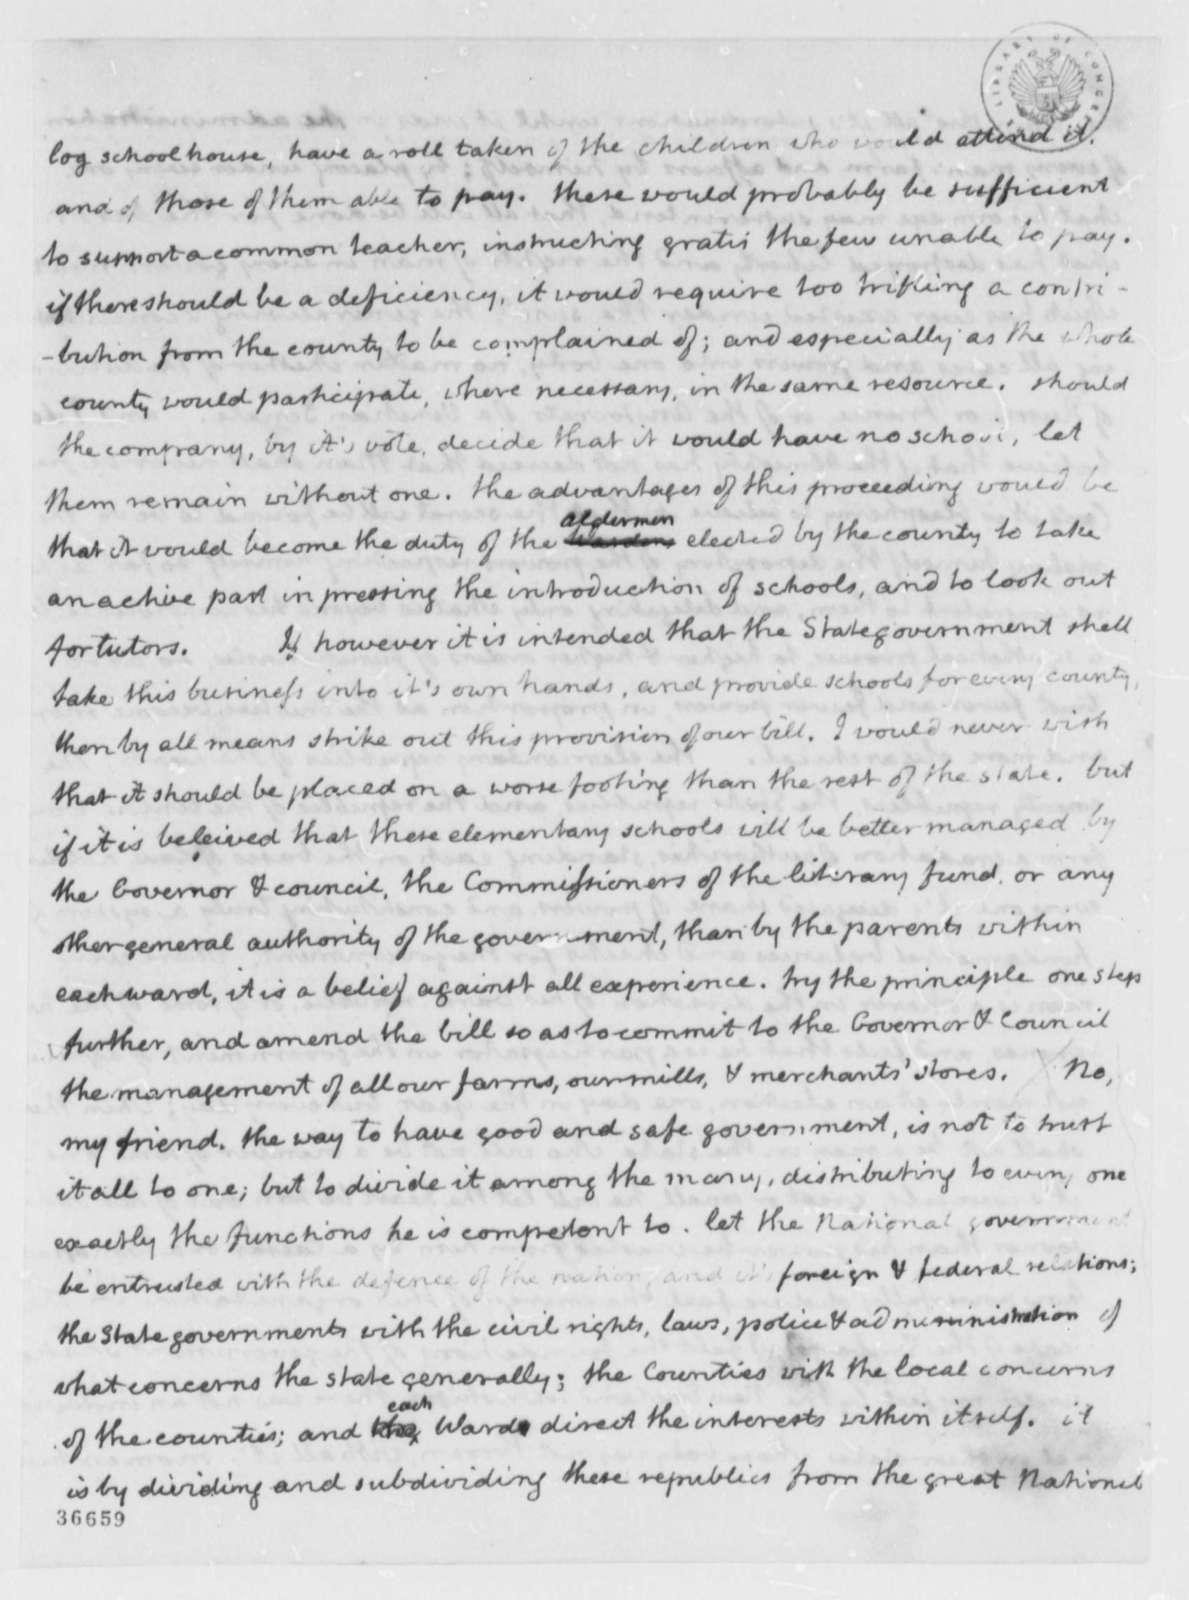 Thomas Jefferson to Joseph C. Cabell, February 2, 1816